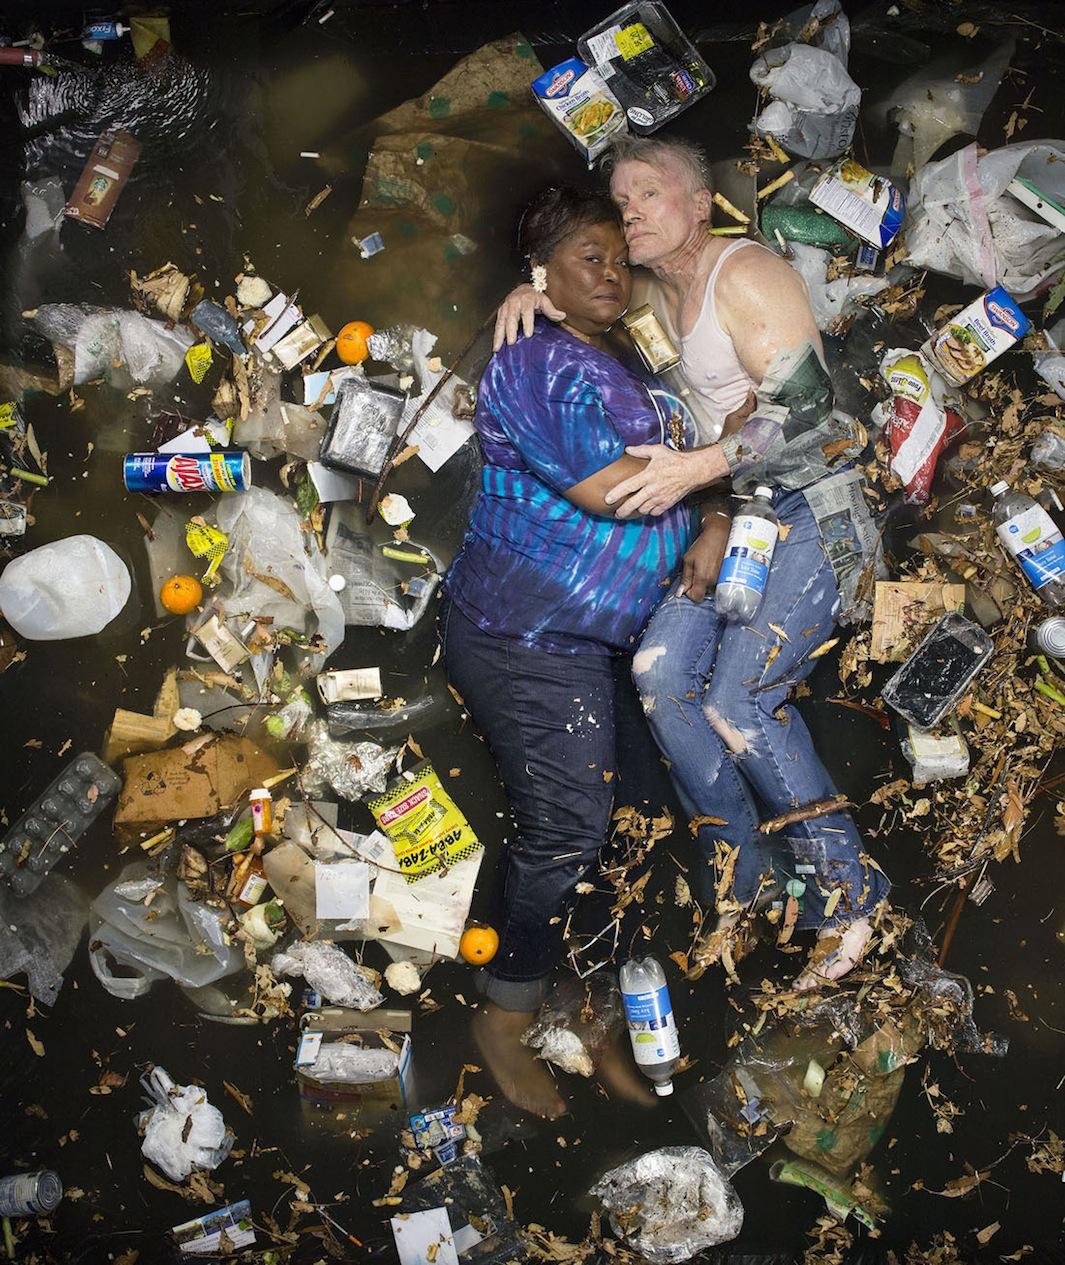 10_7 Days of Garbage_St#9C35EE